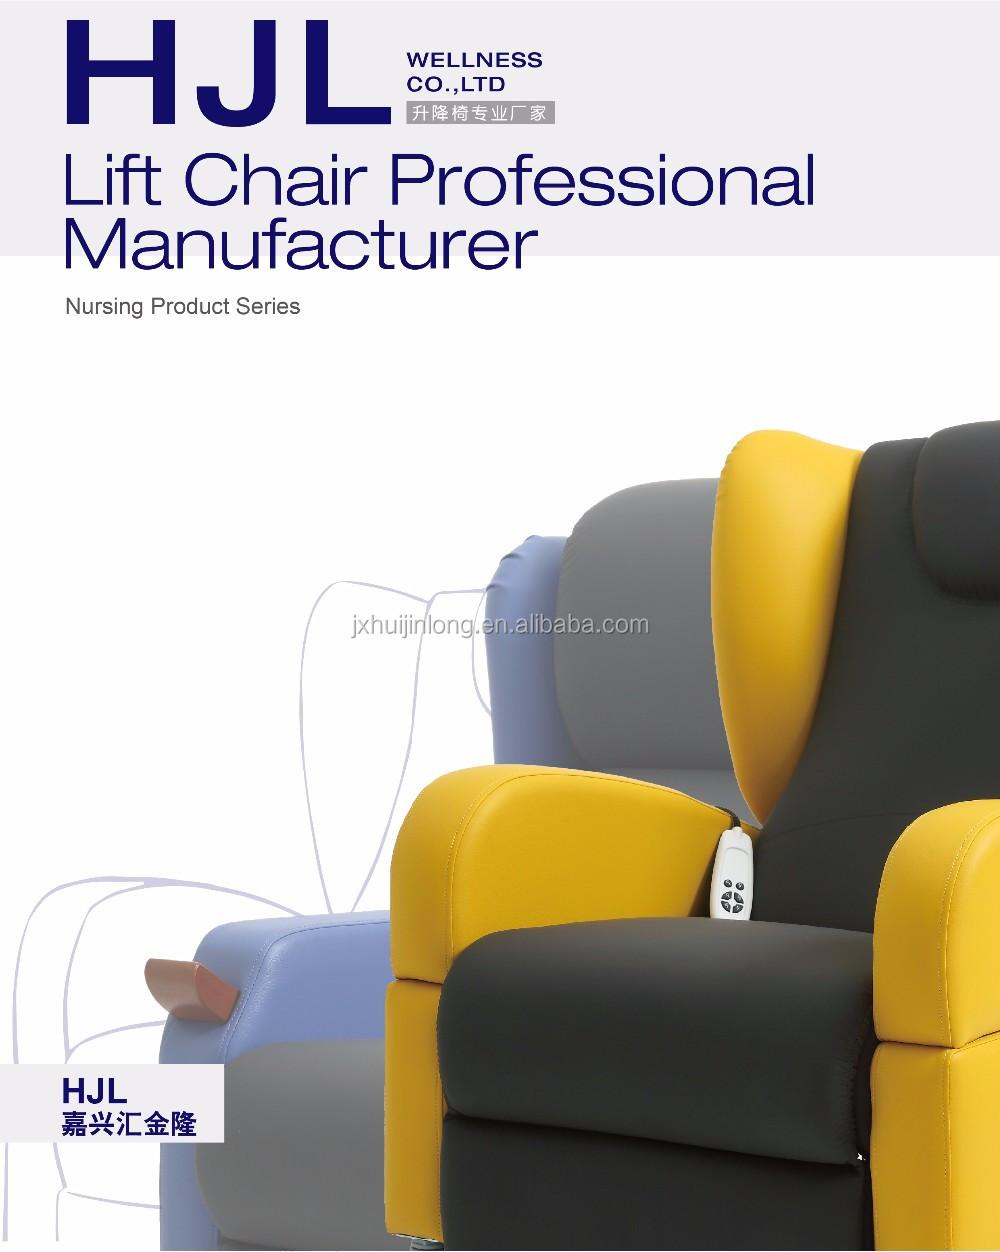 electric adjustable nursing lift chair / medical rise recliner / rehabilitation / health elderly nursing care  sc 1 st  Alibaba & Electric Adjustable Nursing Lift Chair / Medical Rise Recliner ... islam-shia.org